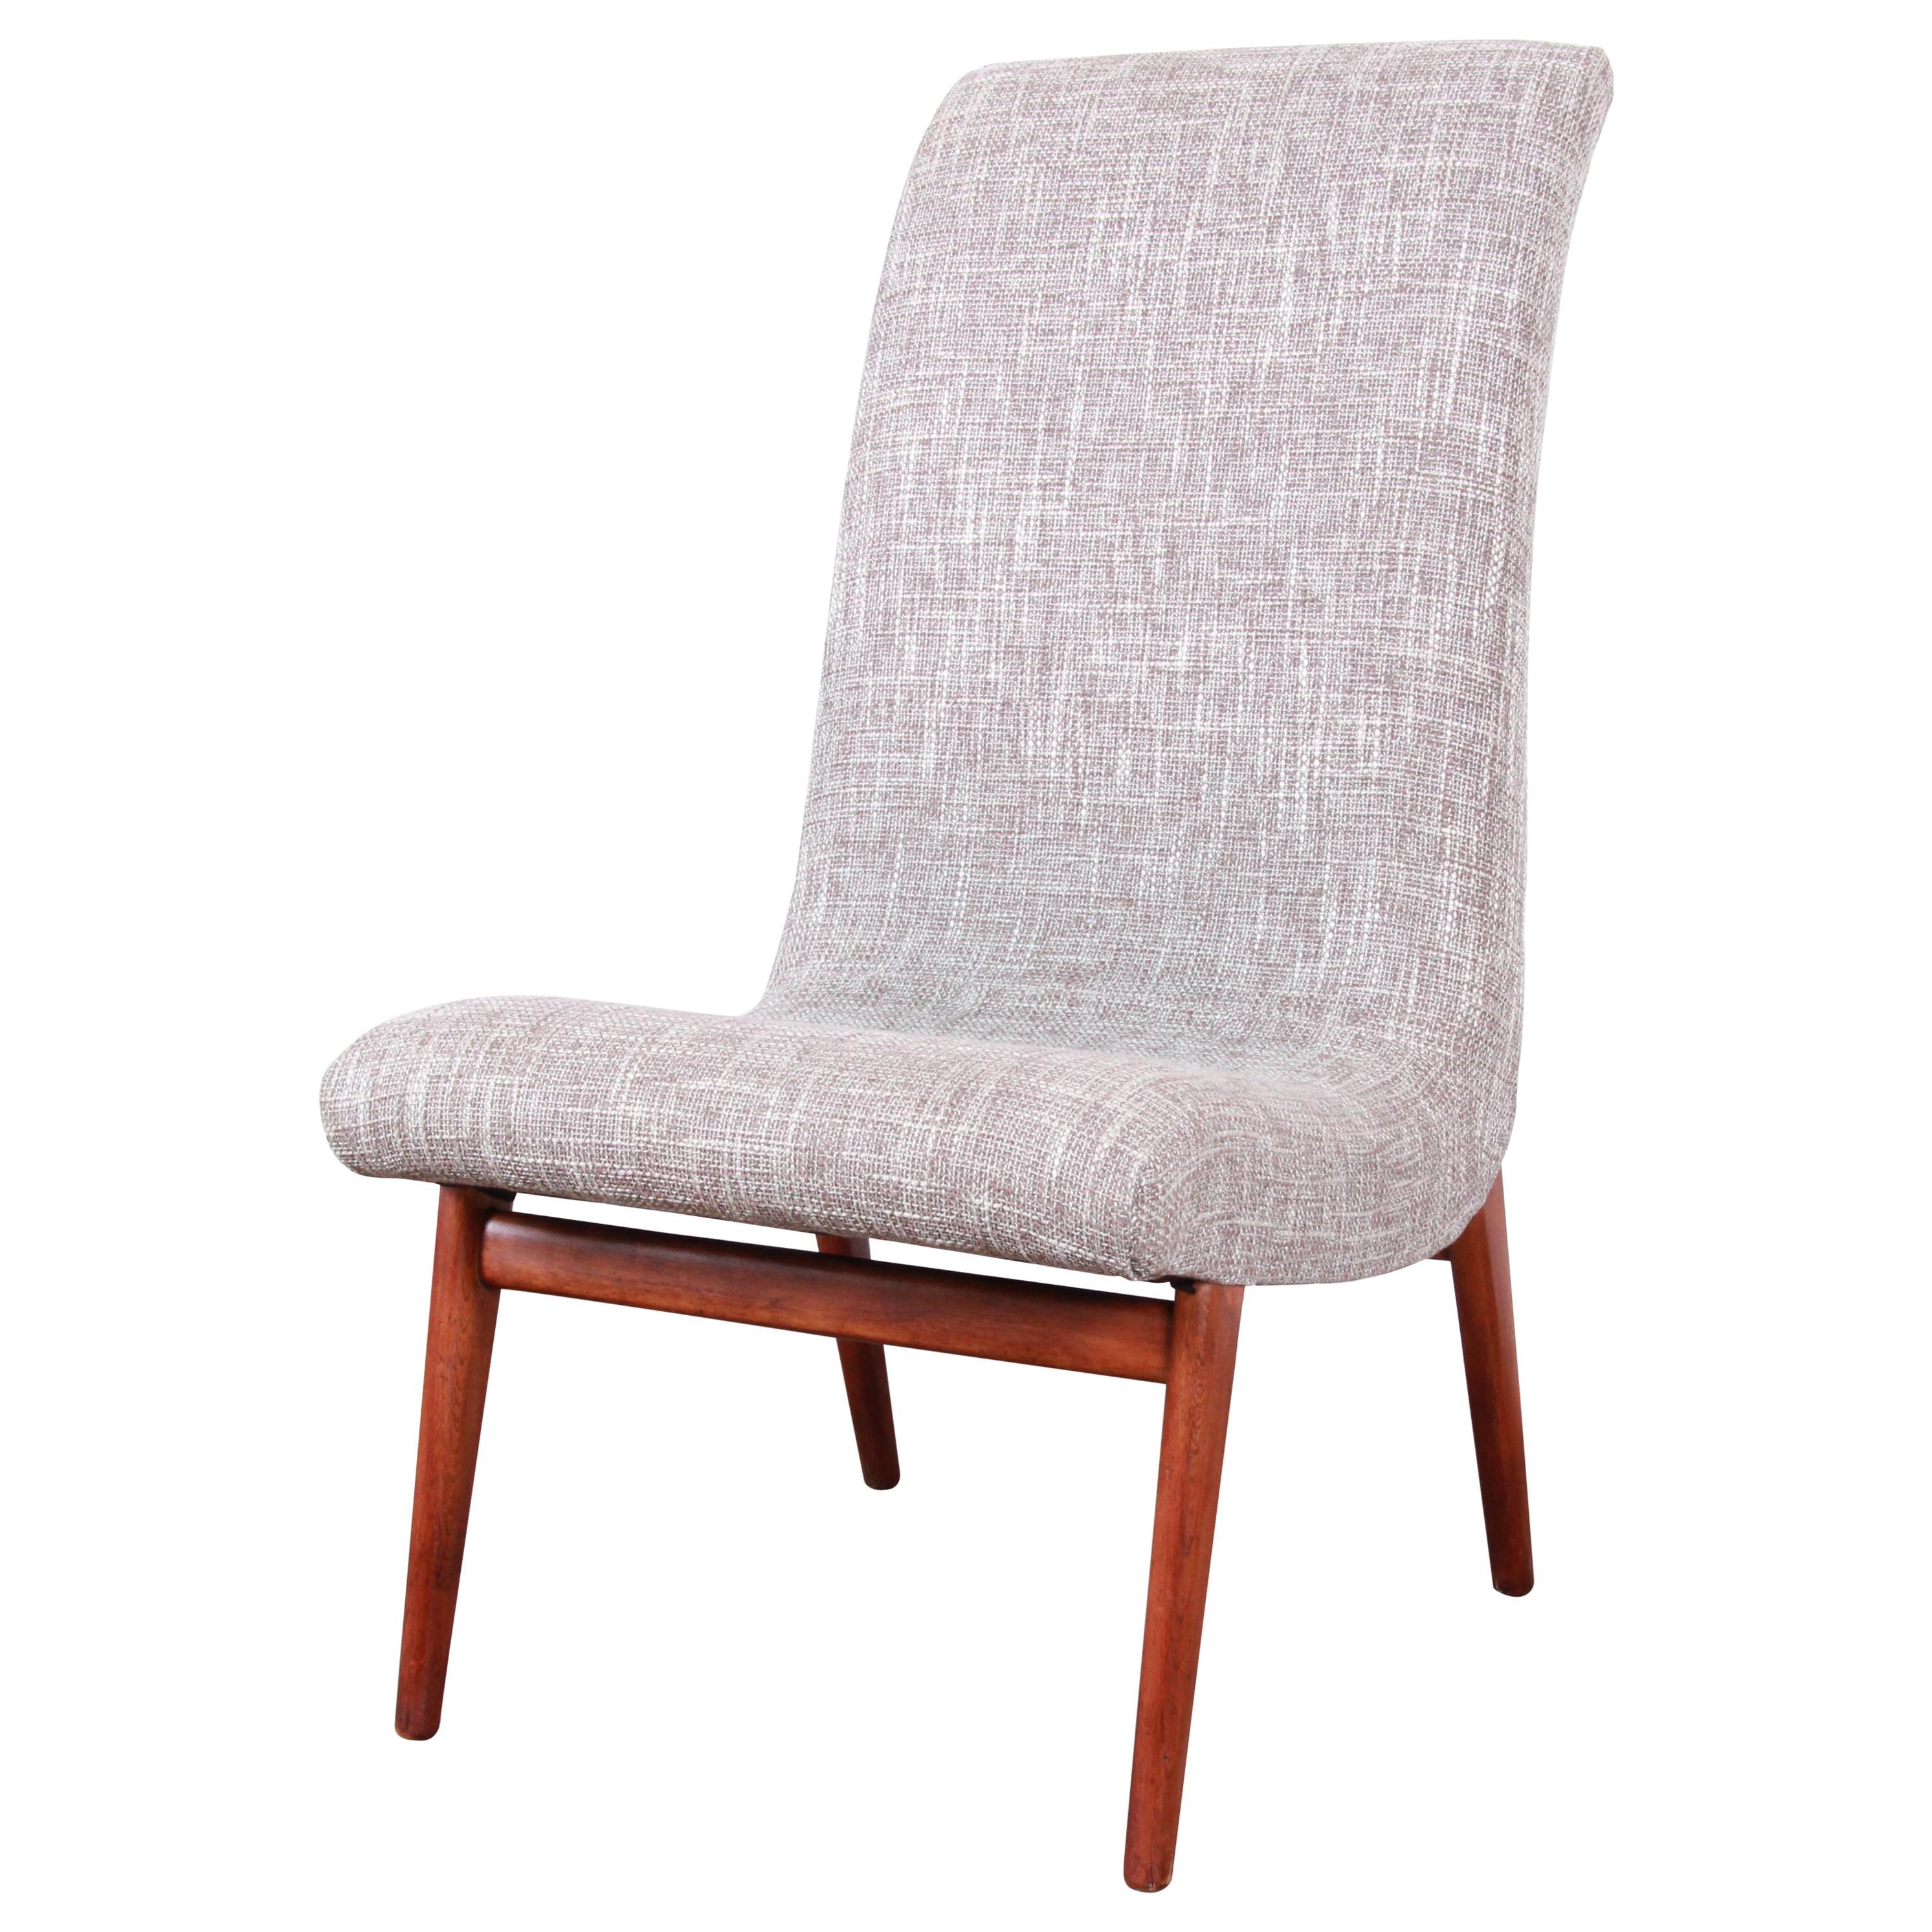 Norman Bel Geddes Mid-Century Modern Slipper Chair, Newly Reupholstered